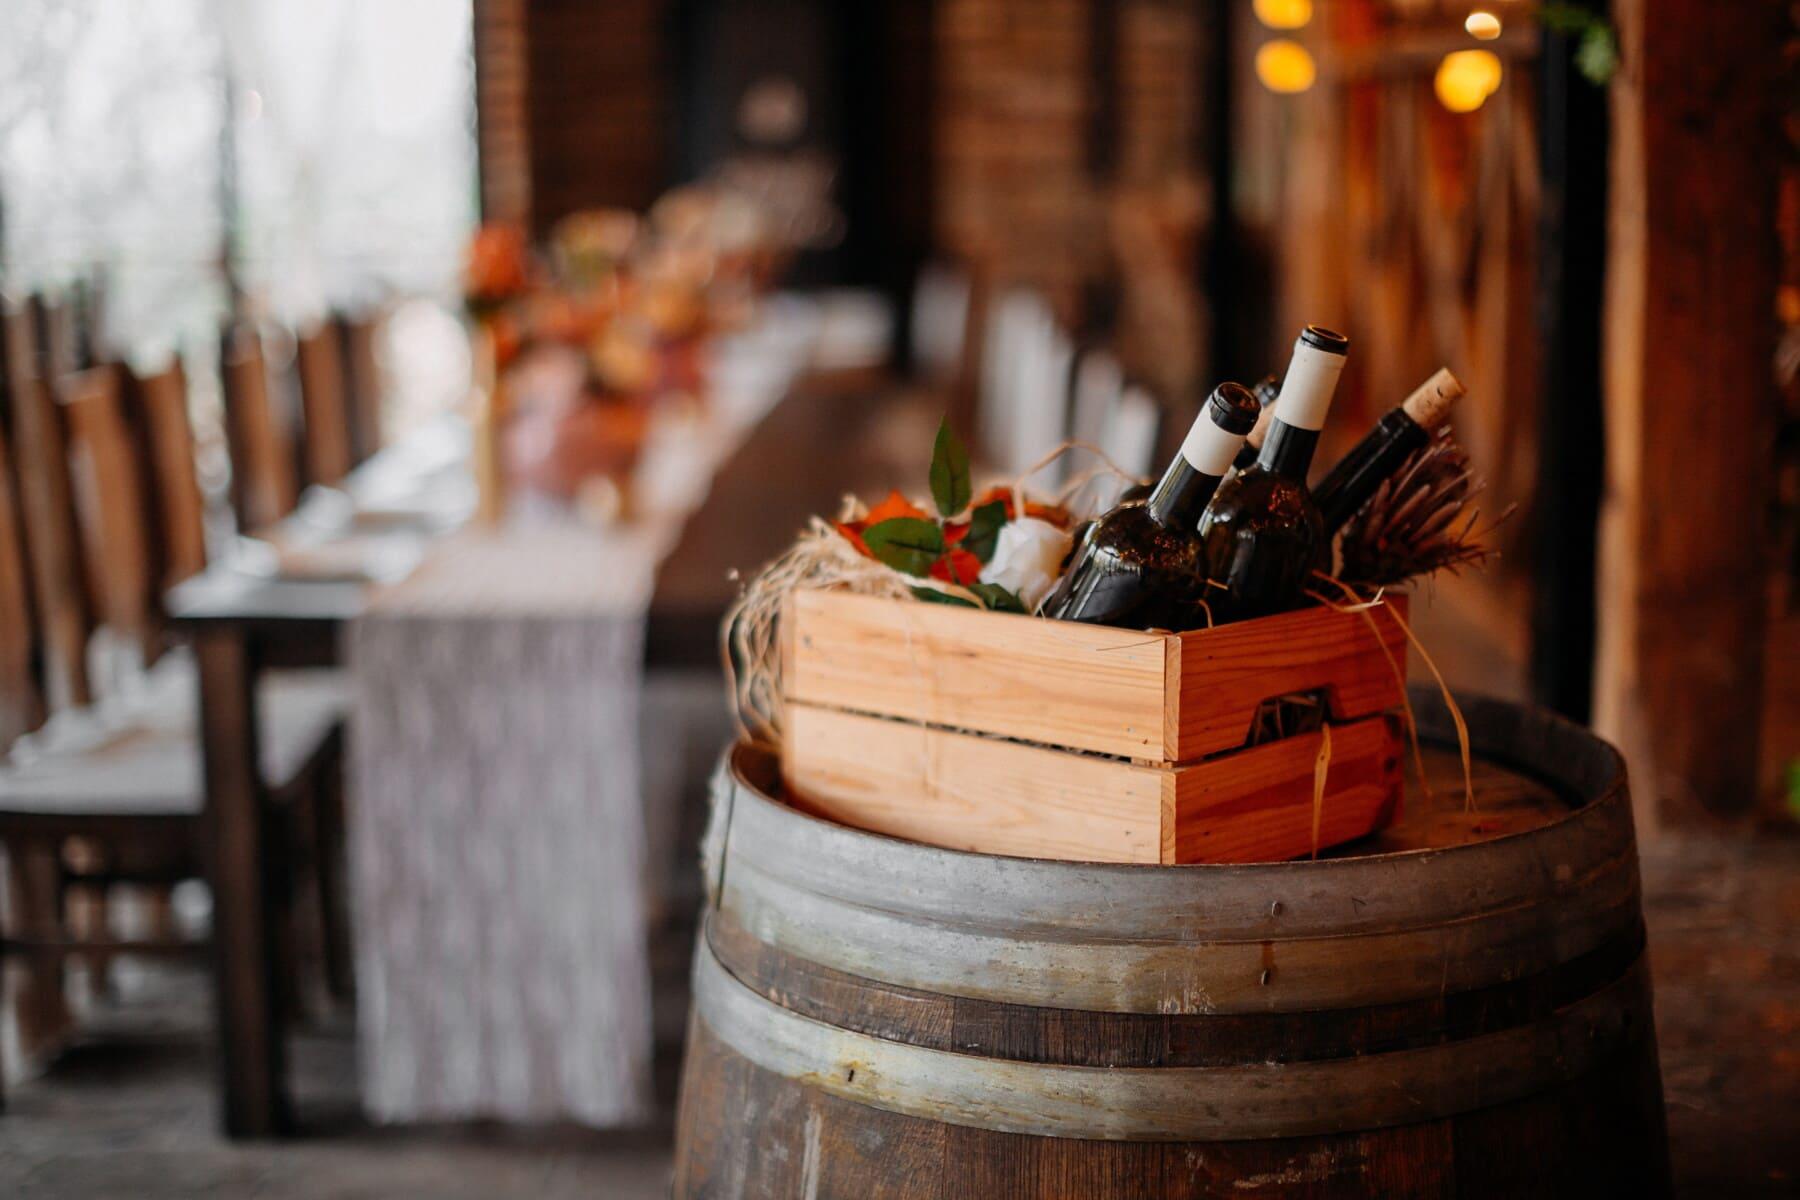 wine, bottles, red wine, winery, box, barrel, wooden, vine, wood, drink